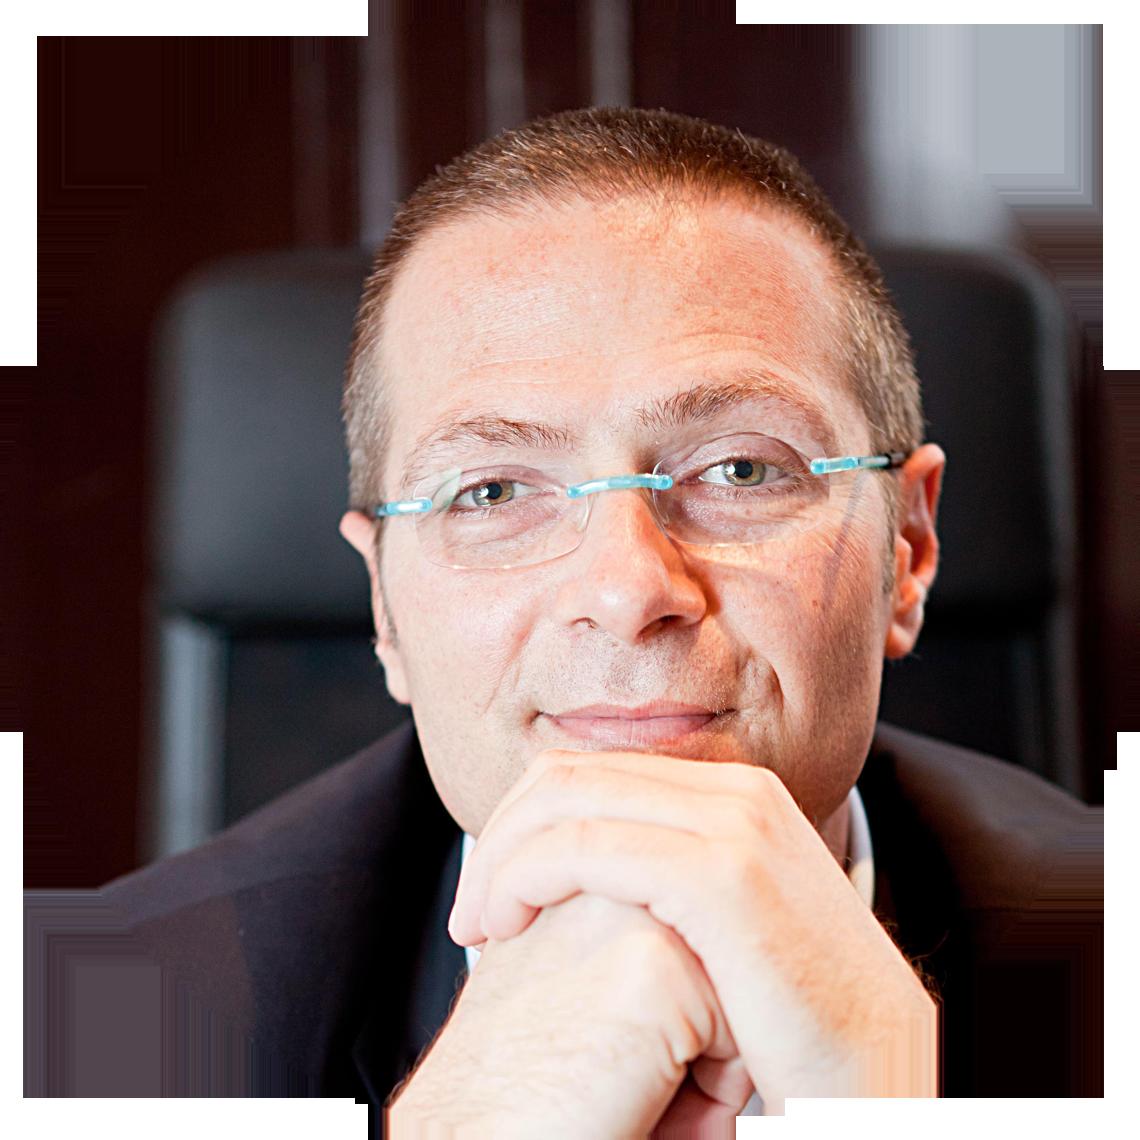 Dott. Matteo Tretti Clementoni